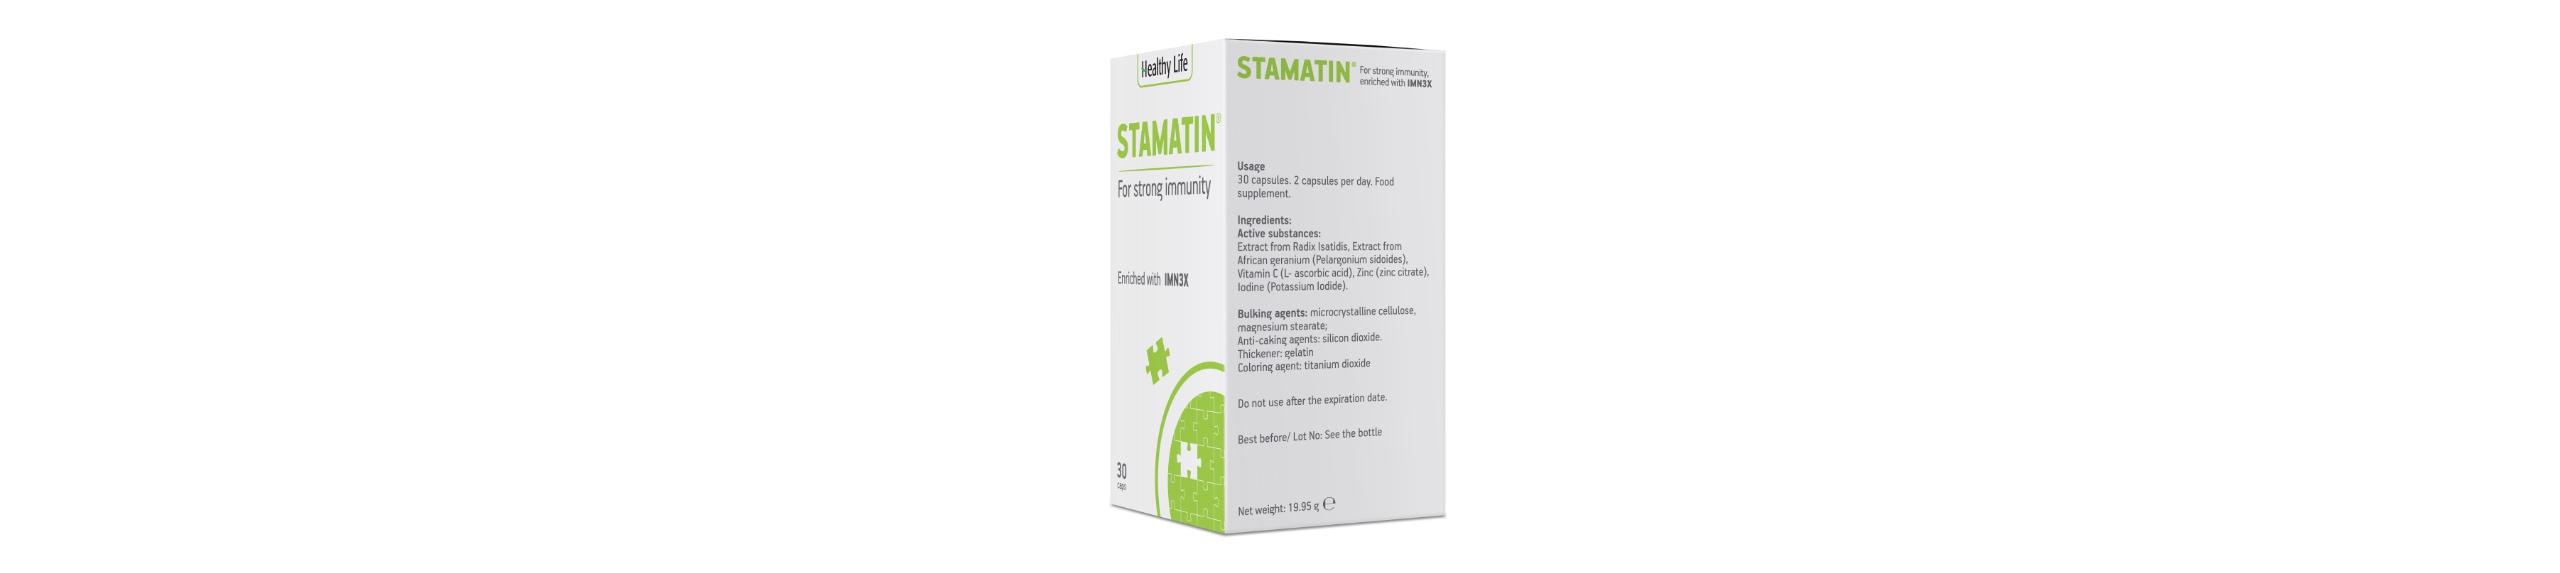 P3-Slider-img-Stamatin3